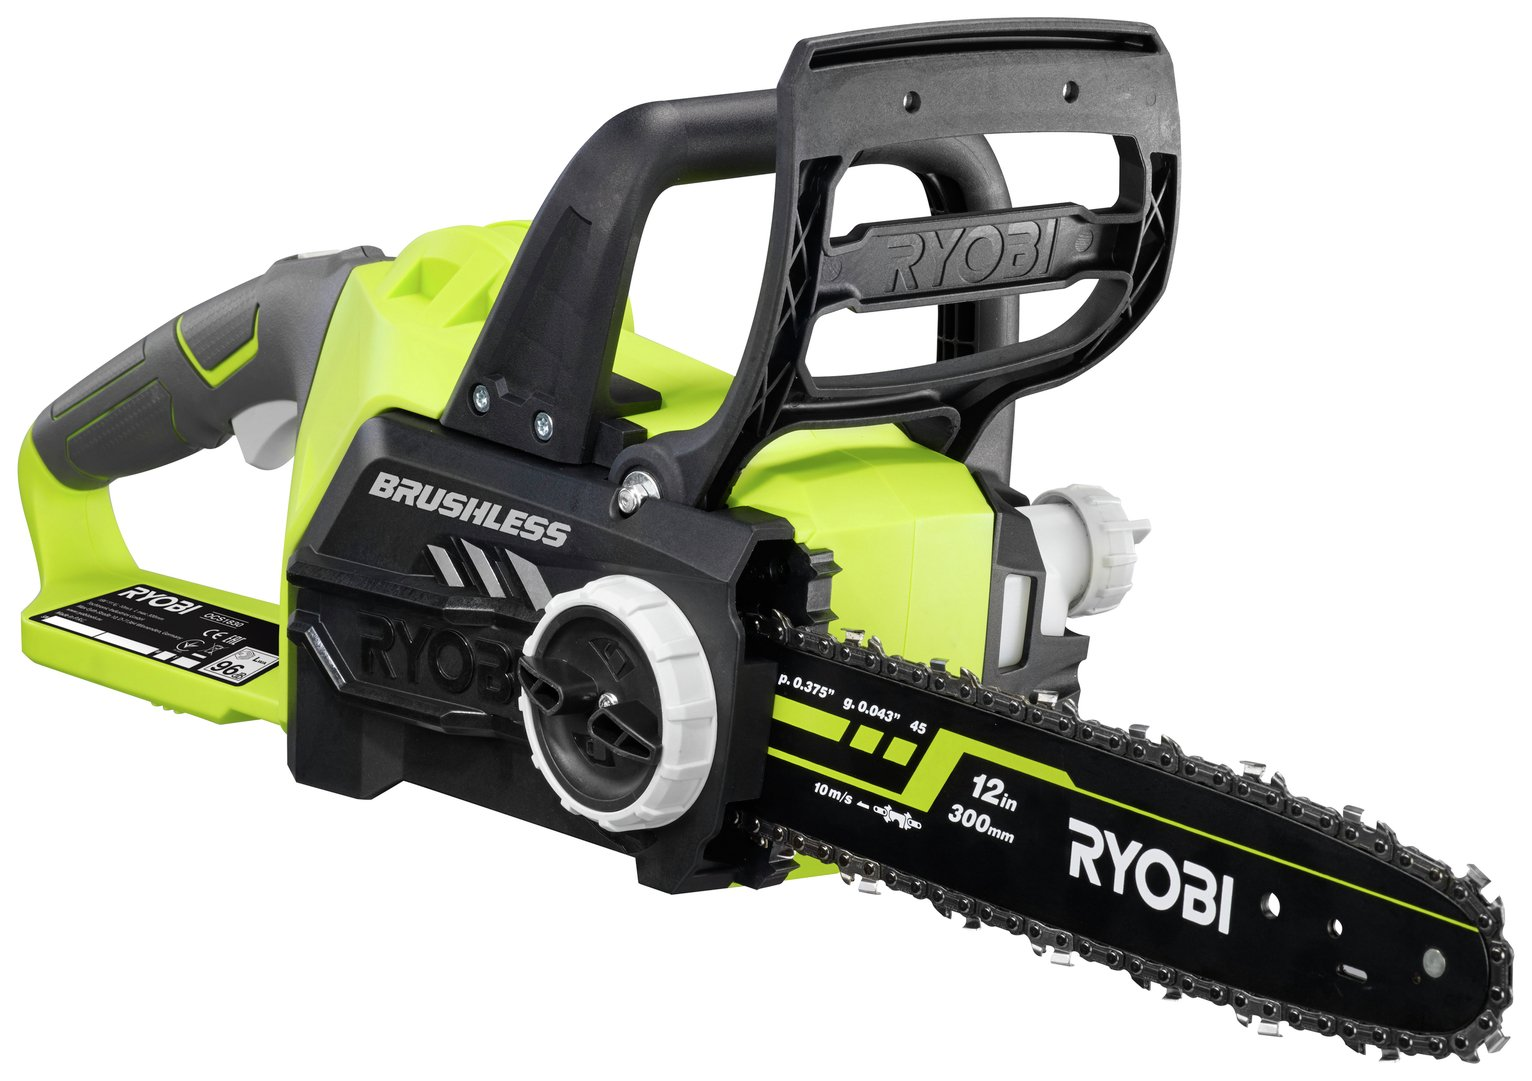 Ryobi OCS1830 30cm Cordless Bare Chainsaw - No Battery